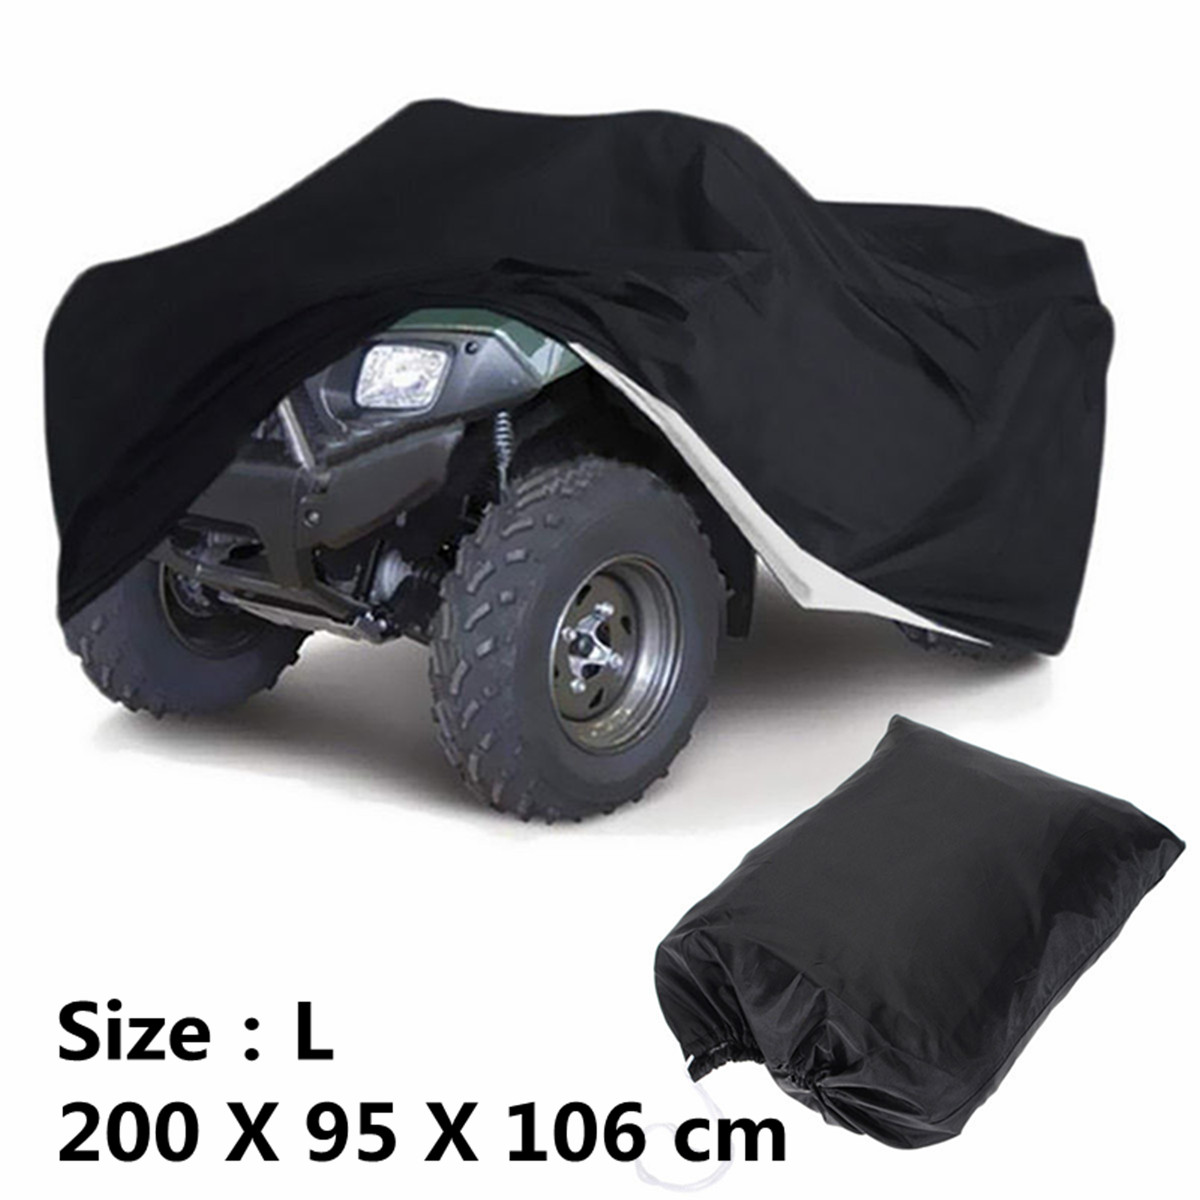 Tamaños L XXL XXXL negro Universal motocicleta Quad Bike ATV ATC cubierta bolsa de almacenamiento impermeable